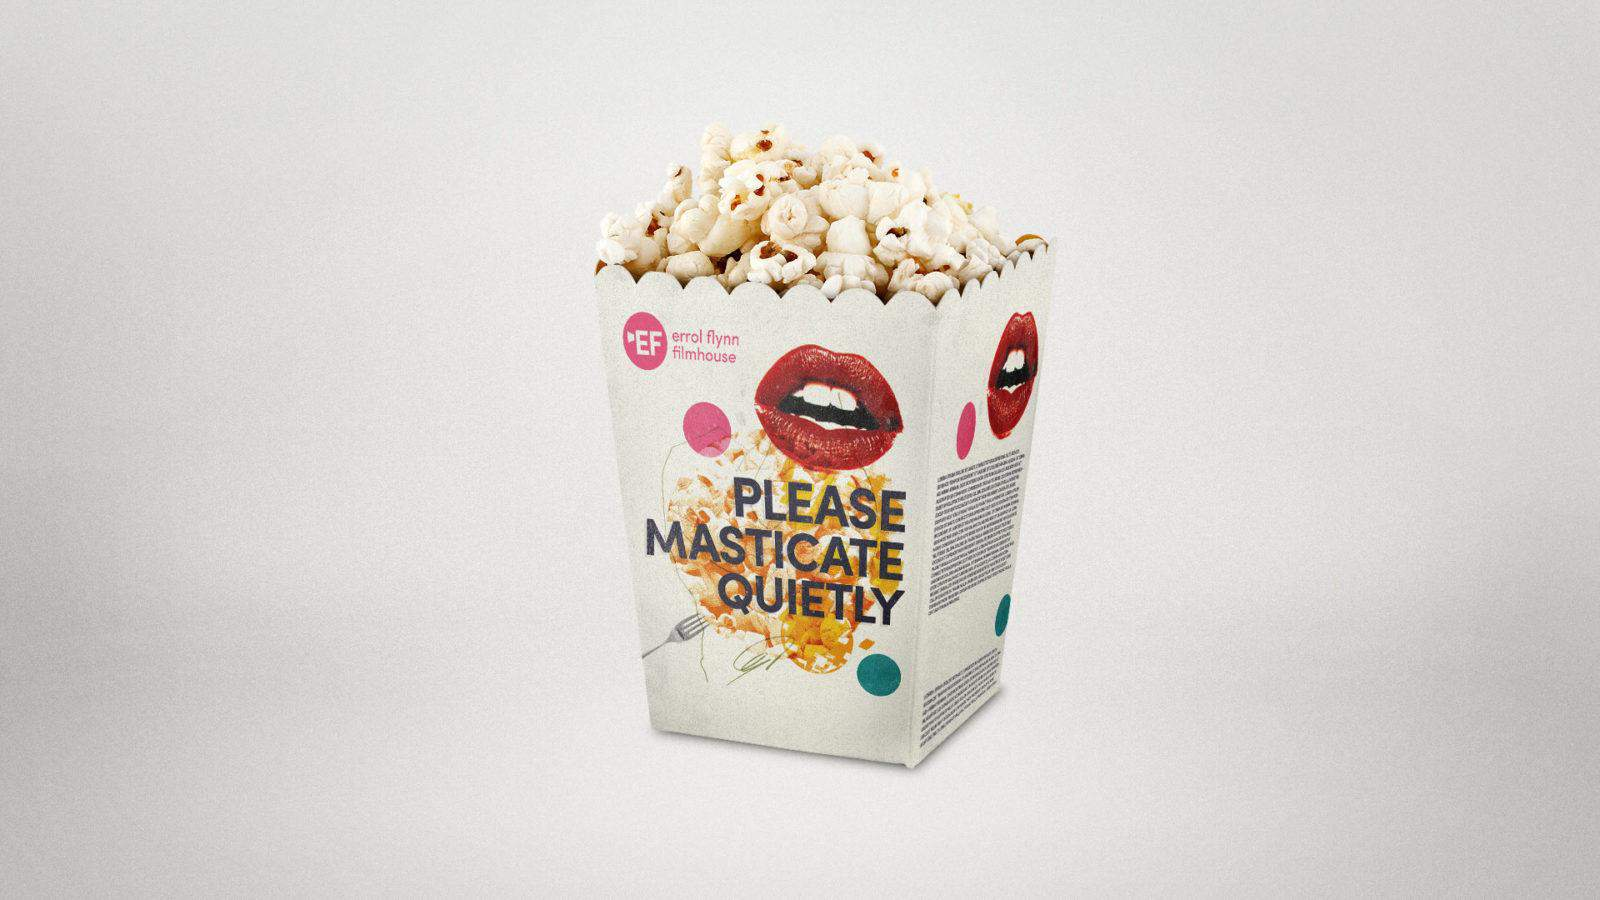 Royal & Derngate - Errol Flynn filmhouse branding